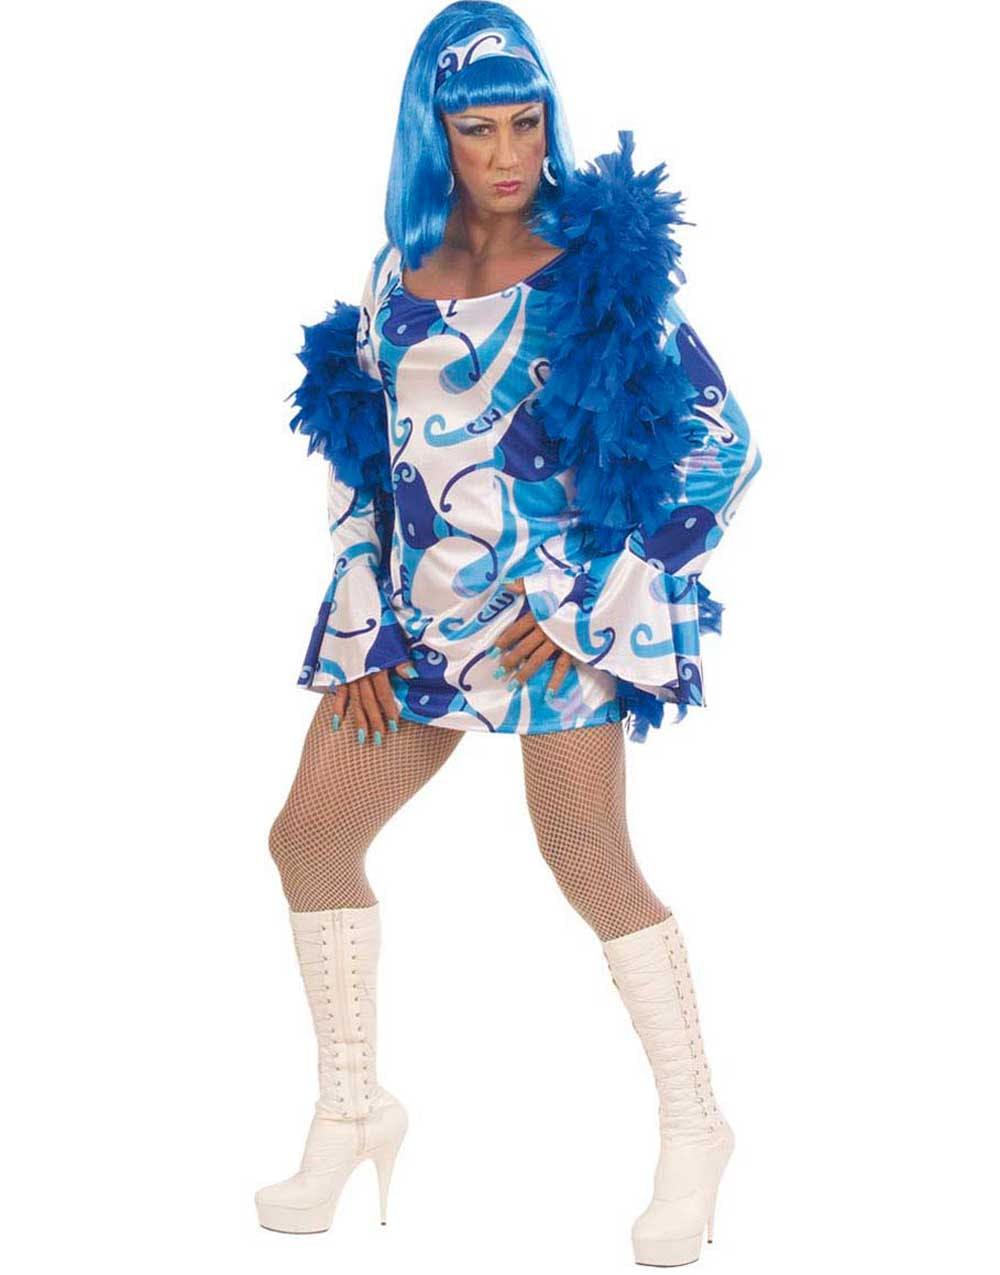 Groovy Chic Drag Queen Kostym - Blå og andre Diverse 09f6e40282098